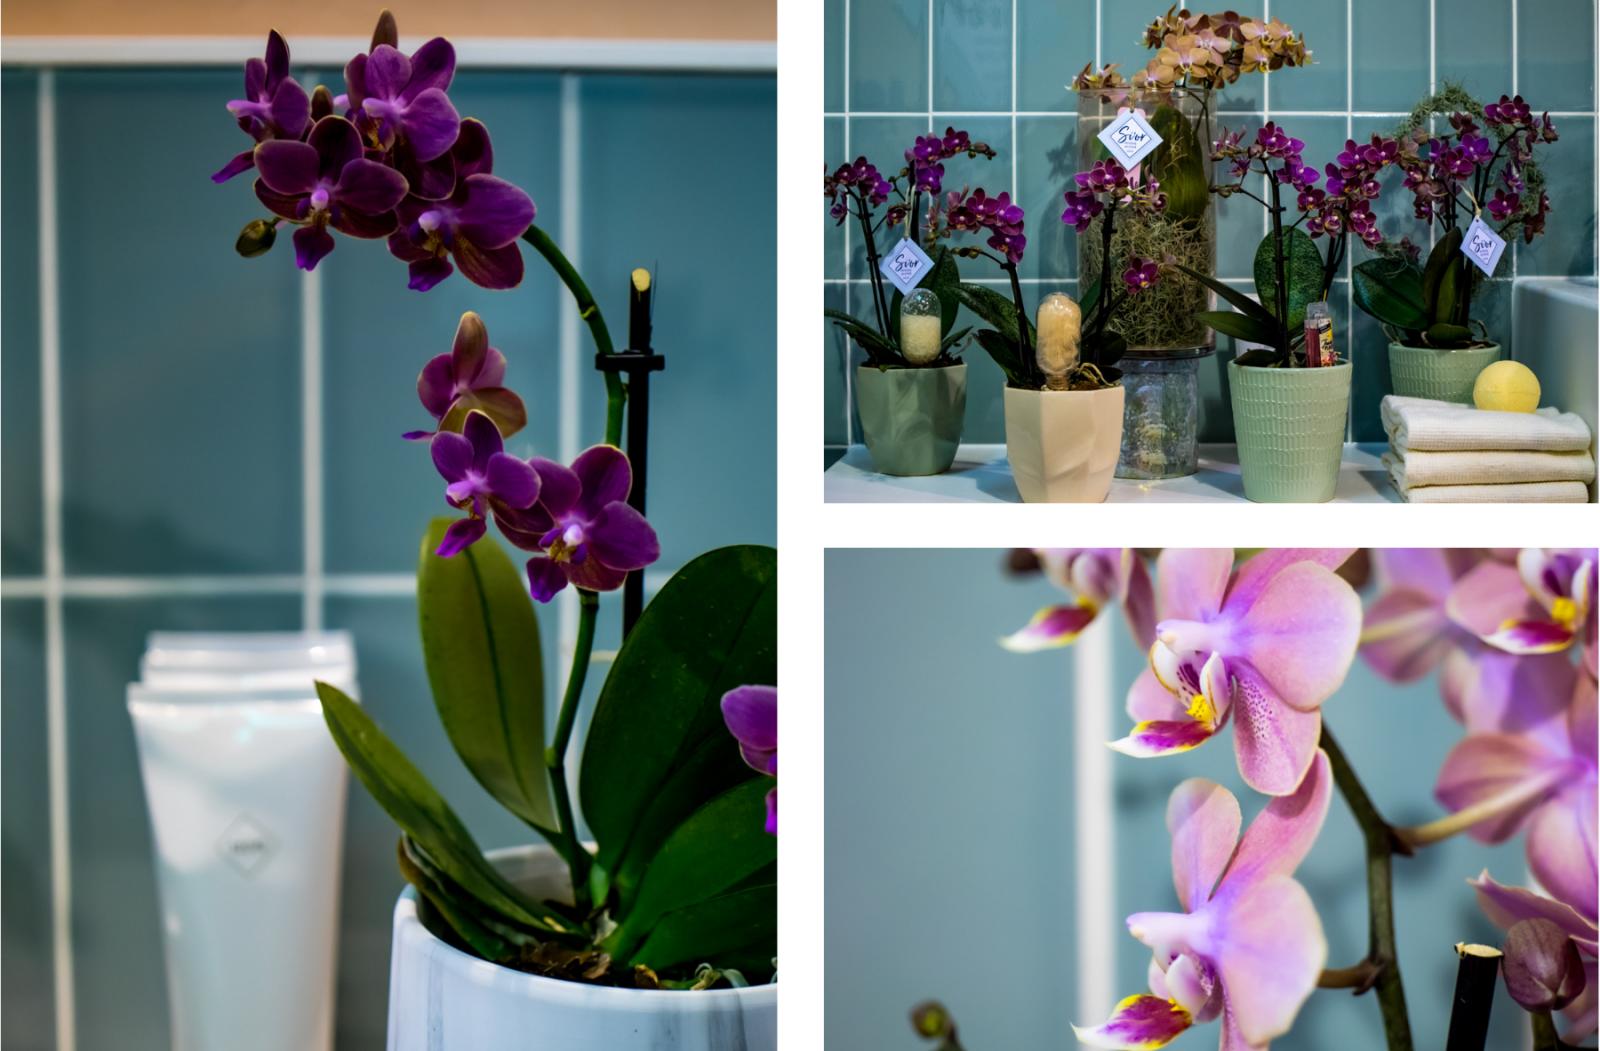 orchidee in de badkamer